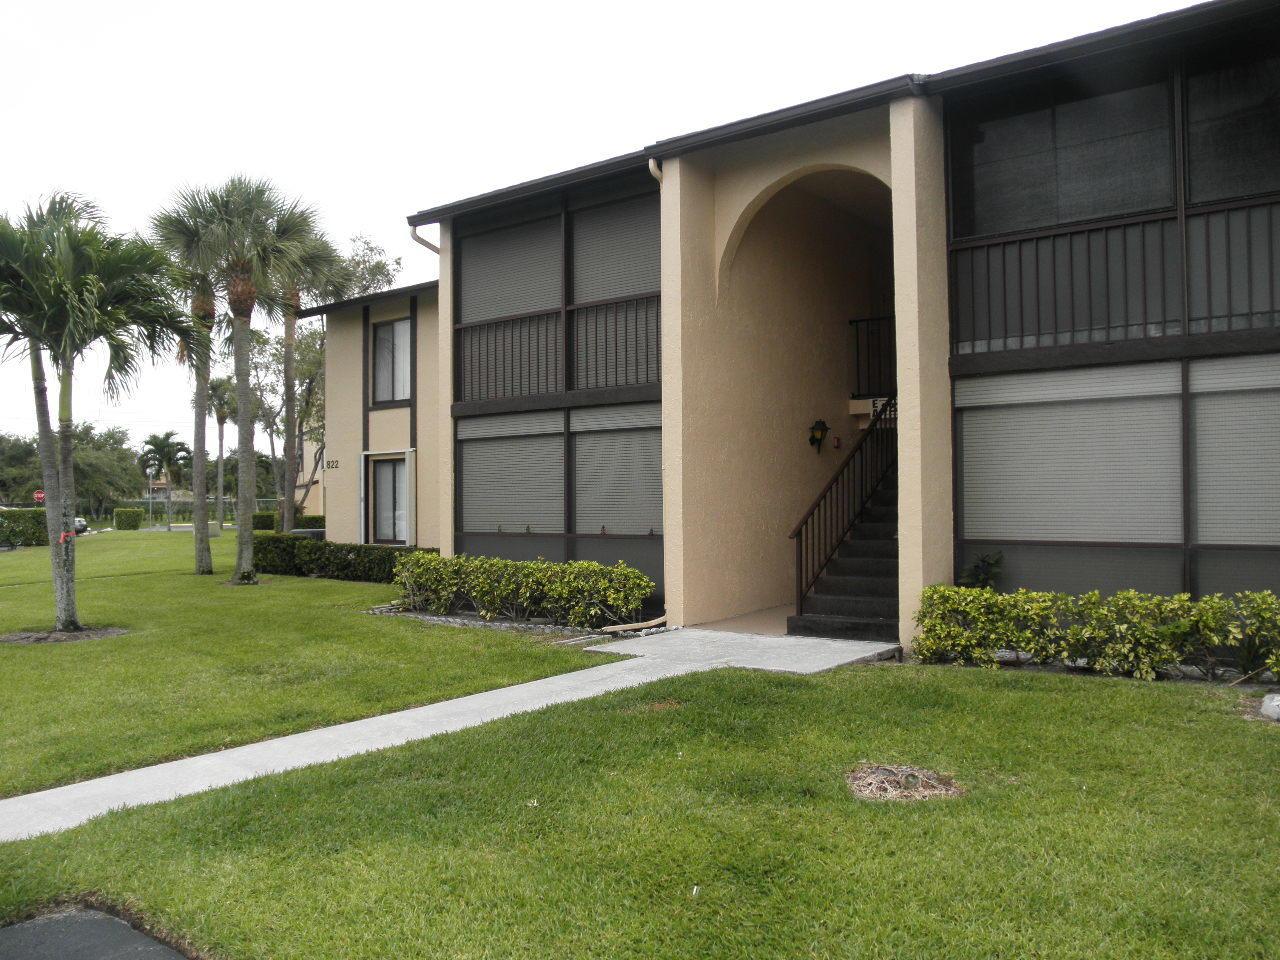 822 Sky Pine Way, Greenacres, Florida 33415, 2 Bedrooms Bedrooms, ,2 BathroomsBathrooms,Condo/Coop,For Rent,Sky Pine,1,RX-10644694